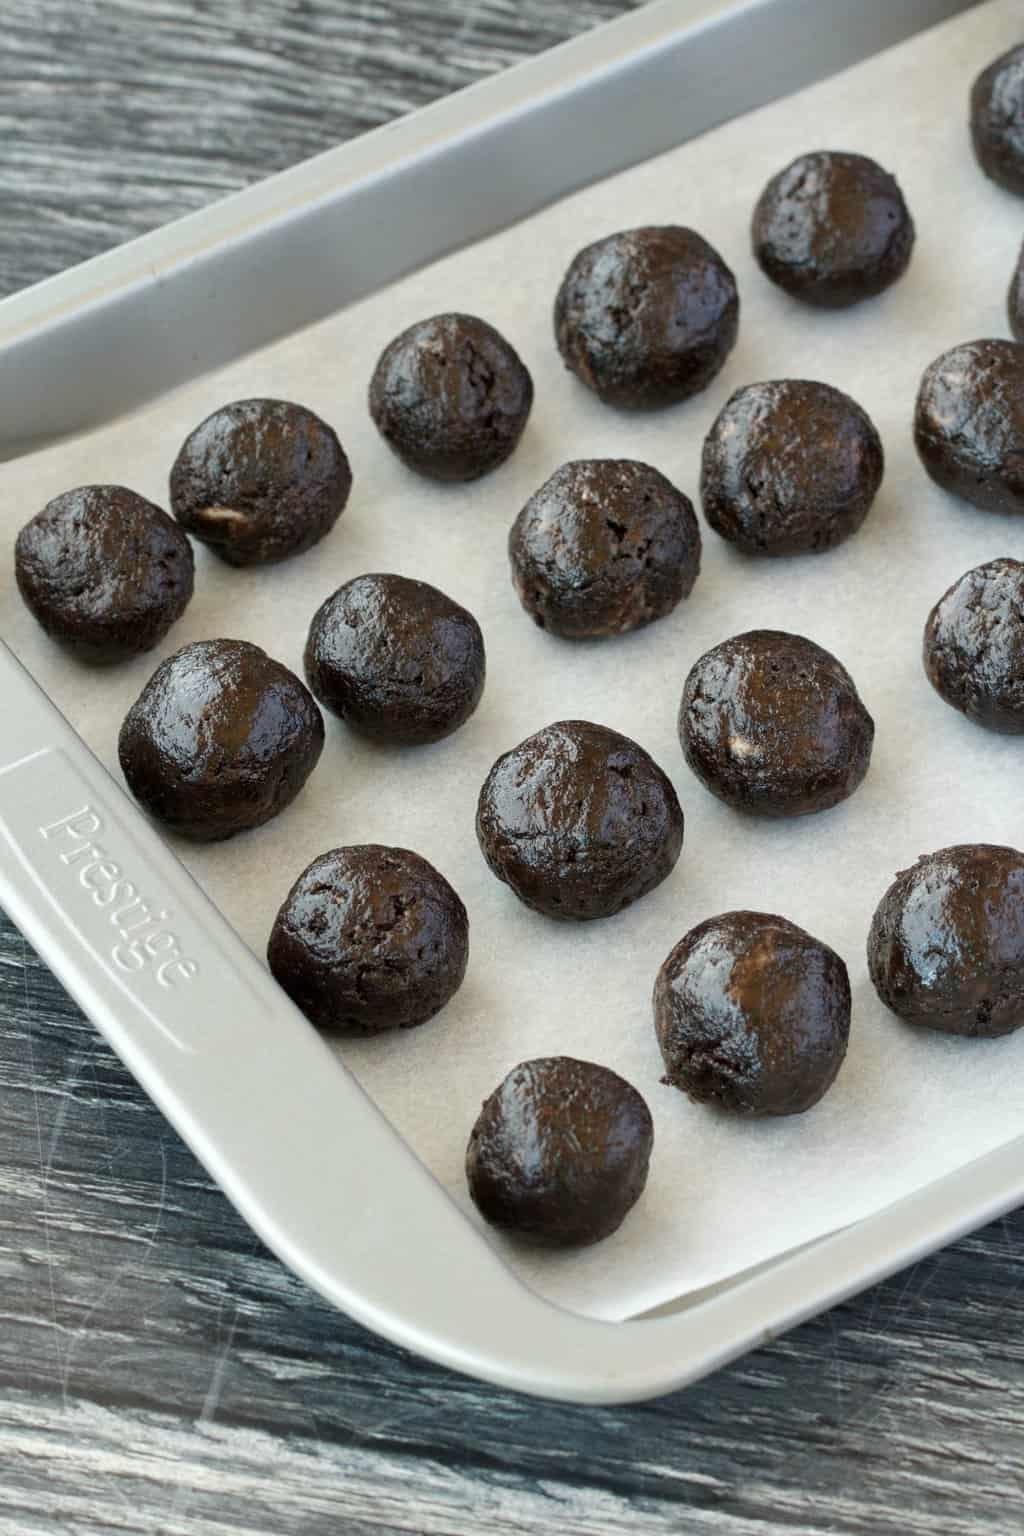 Making Vegan Oreo Truffles #vegan #lovingitvegan #oreotruffles #dairyfree #vegandessert